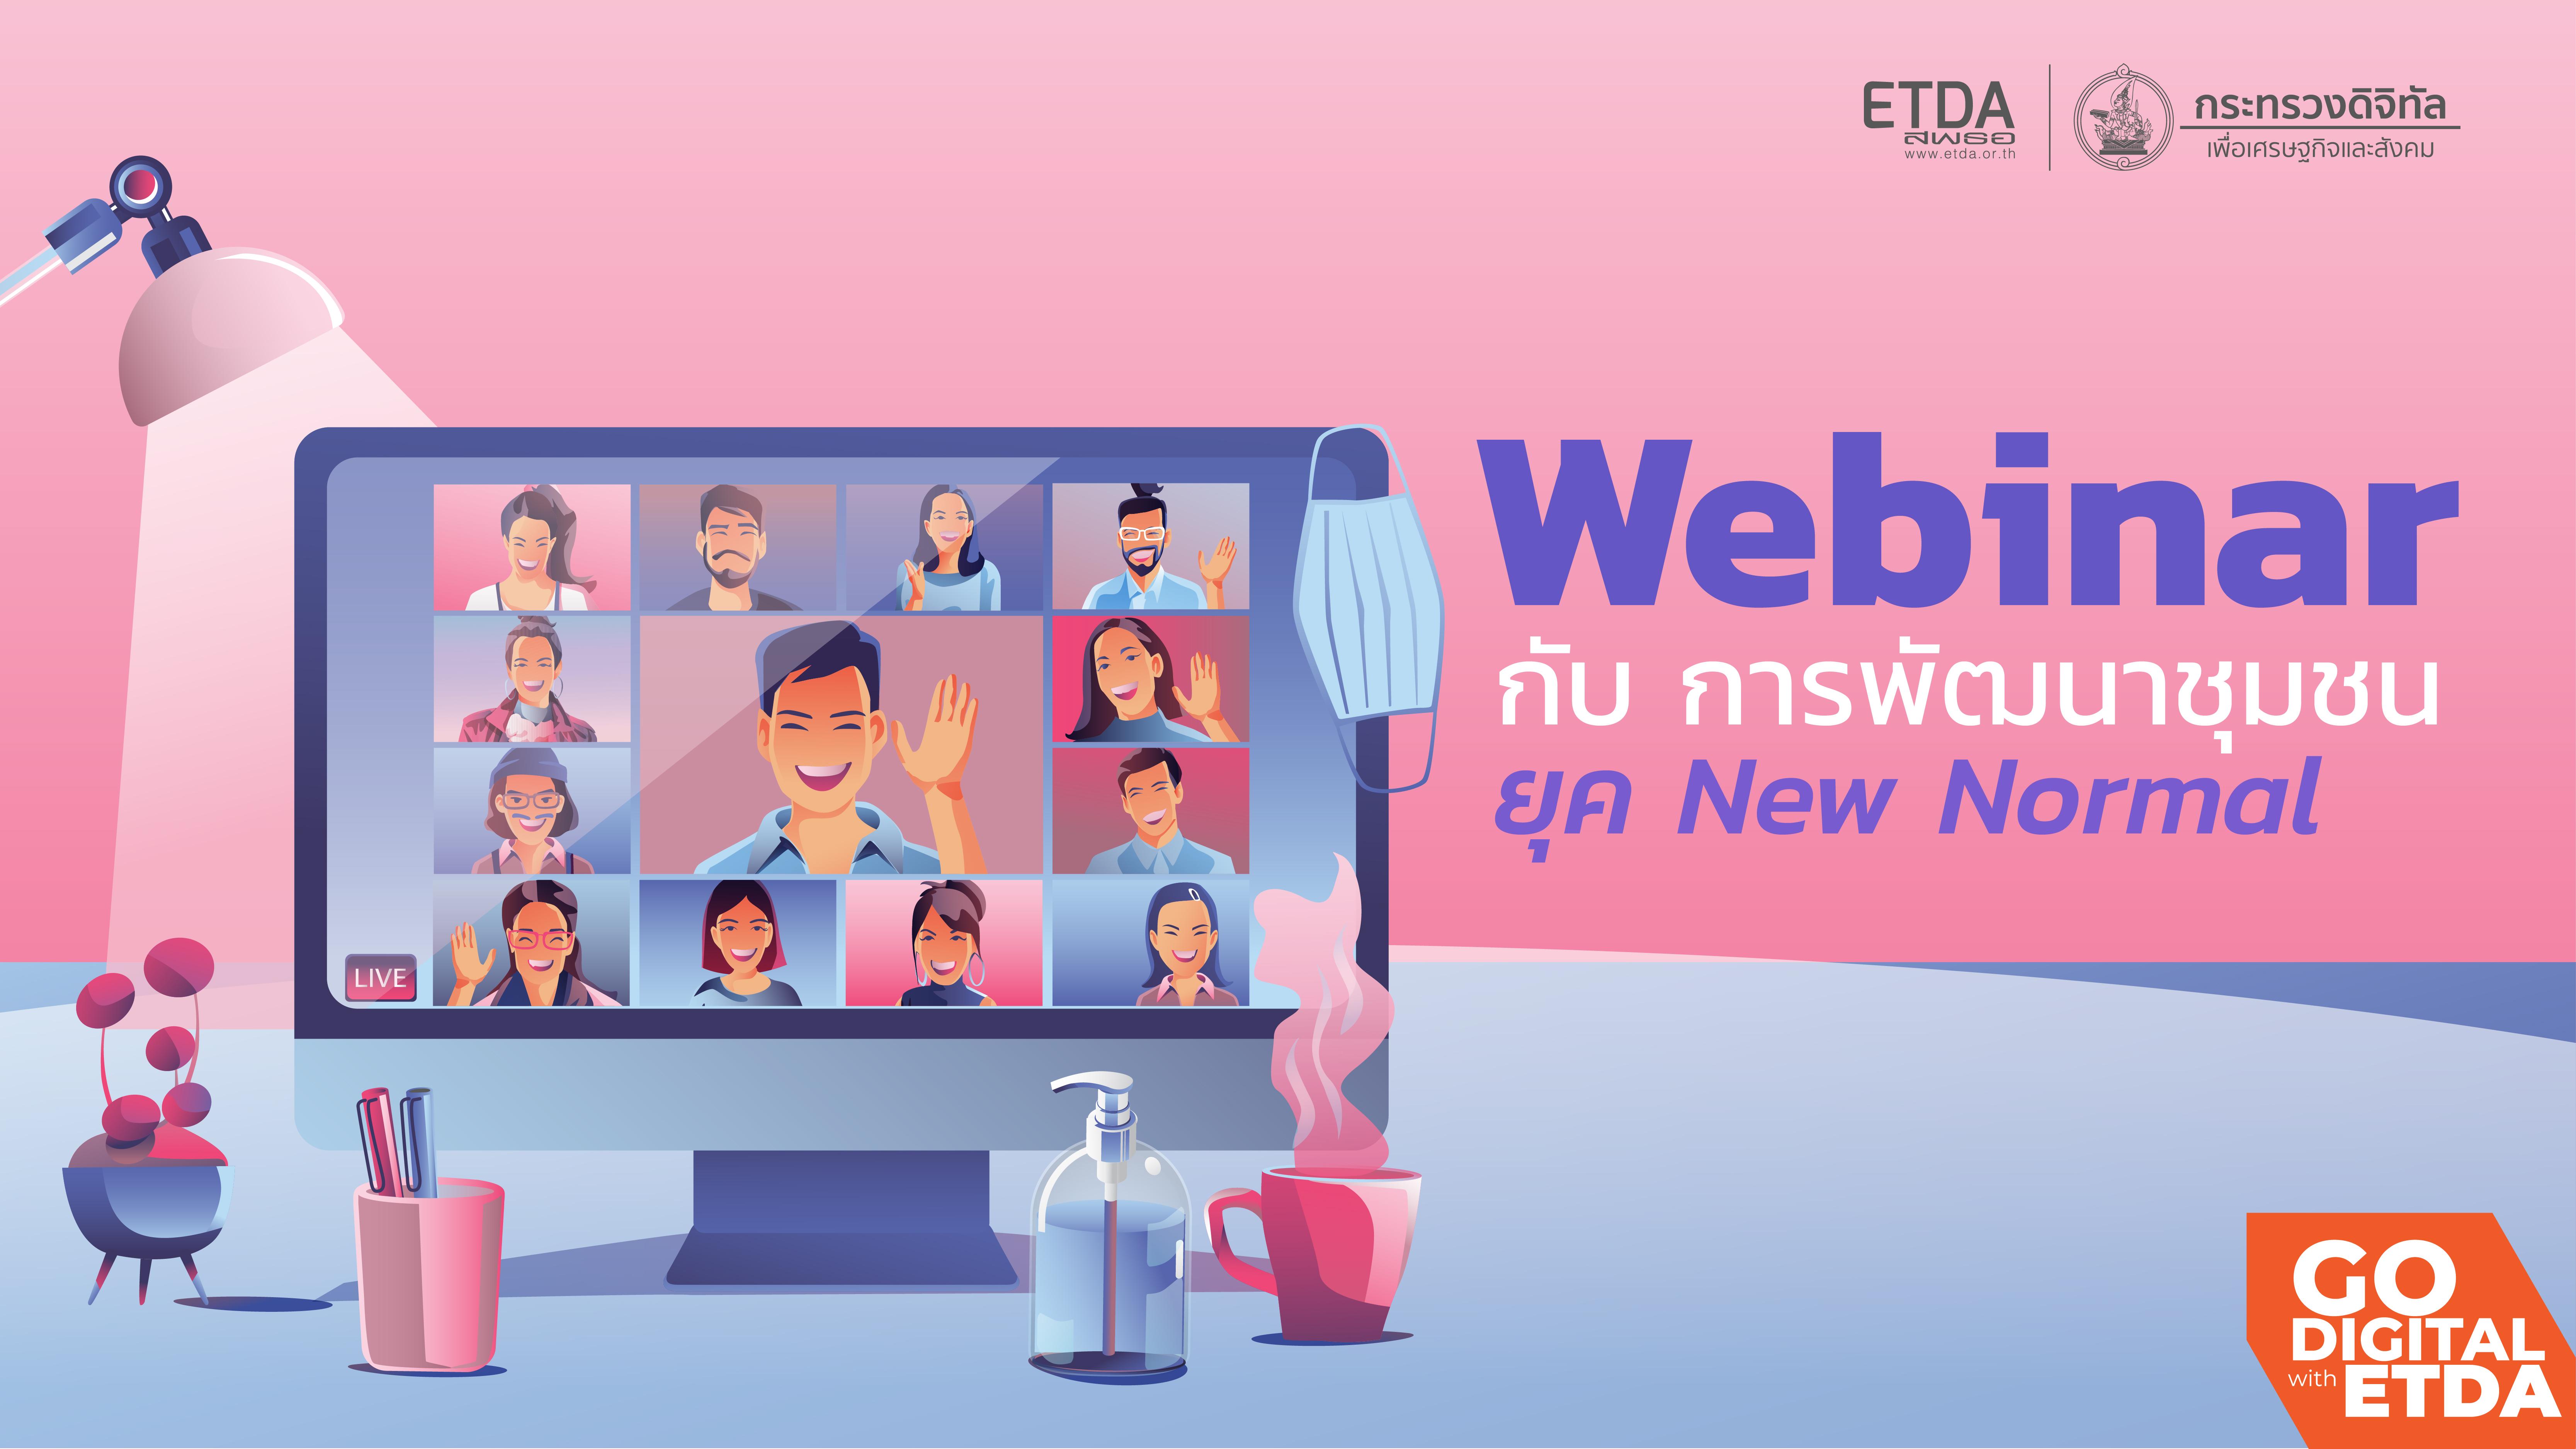 Webinar กับ การพัฒนาชุมชนยุค New Normal